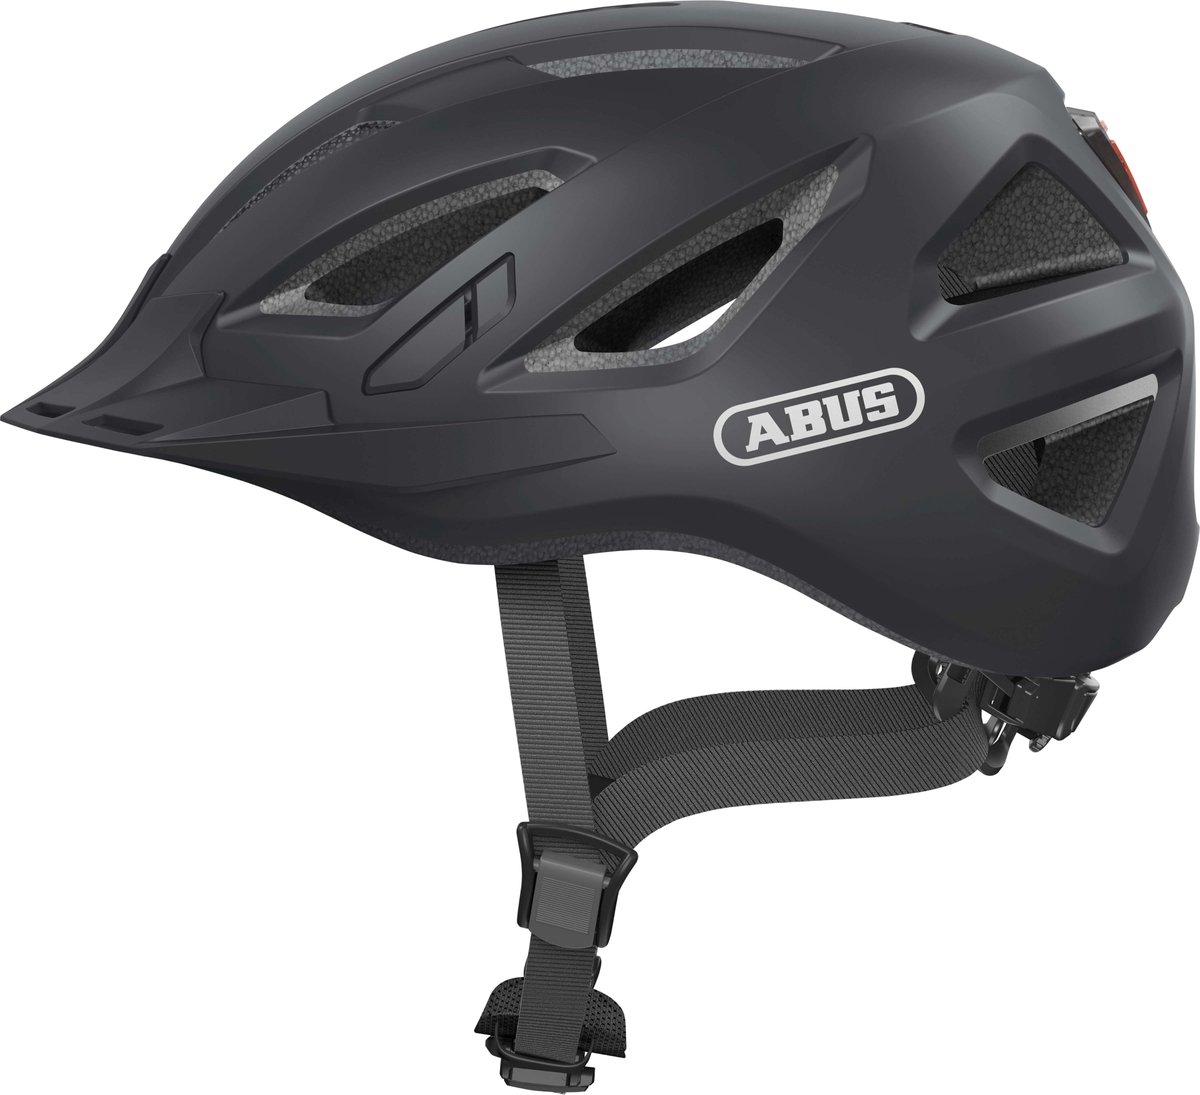 ABUS Urban-I 3.0 Fietshelm - Maat  L (56-61 cm) - velvet black